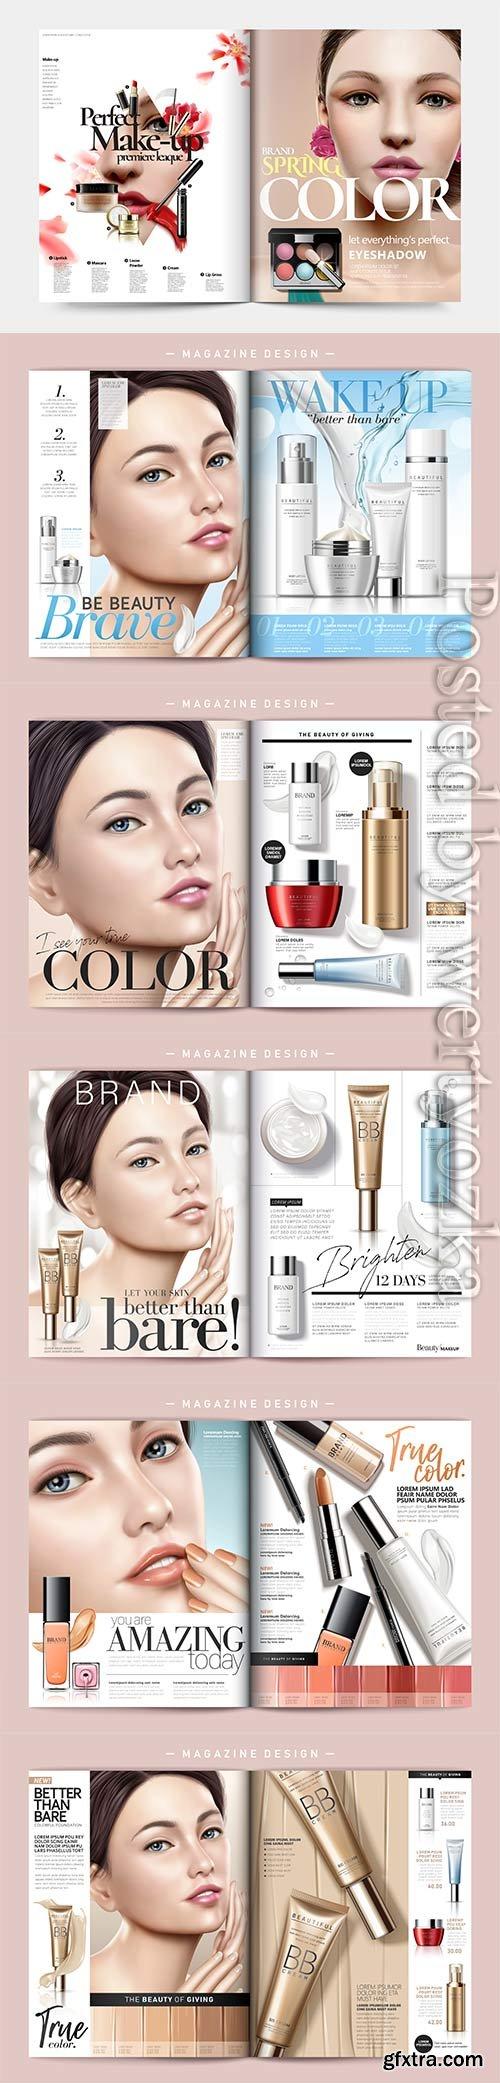 Skin care magazine vector template